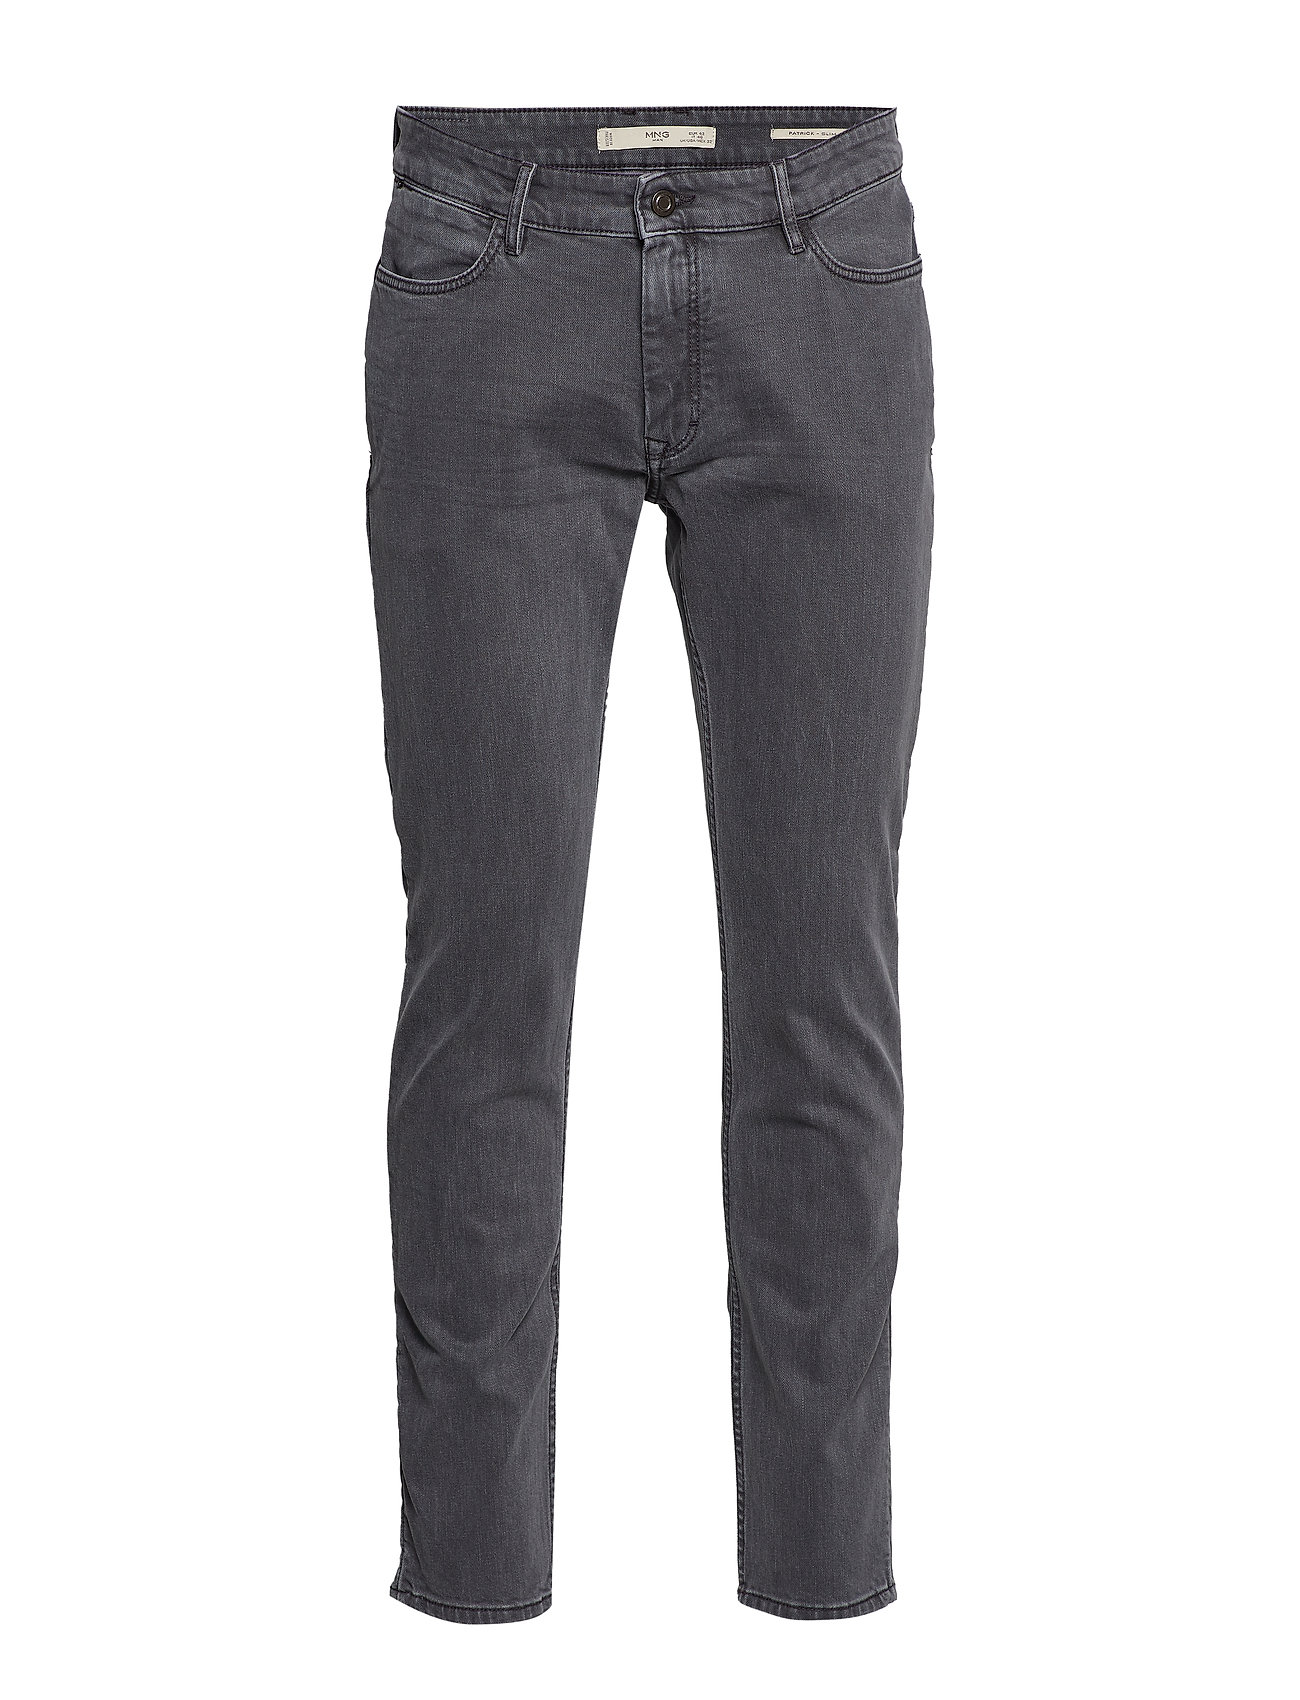 Mango Man Slim fit grey Patrick jeans - OPEN GREY